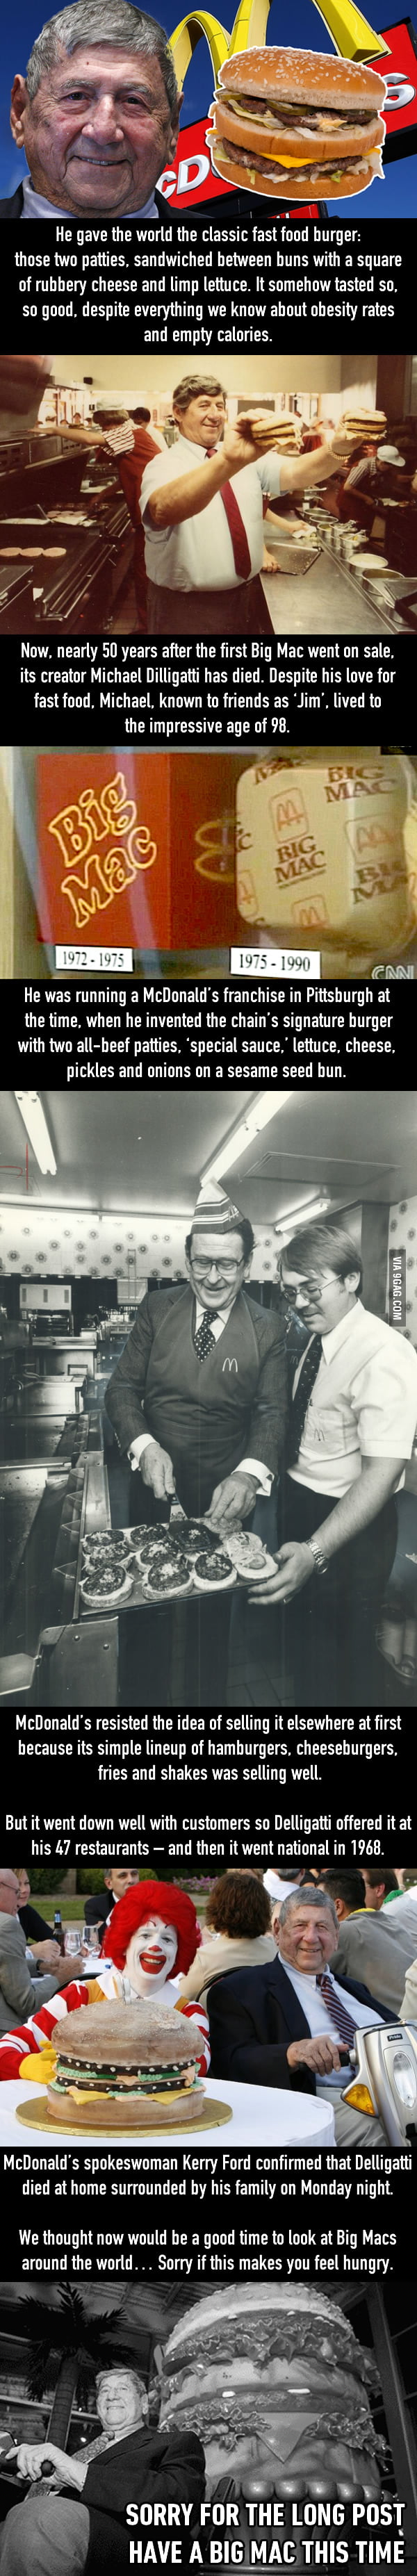 RIP Mike Dilligatti, you gave the world the Big Mac